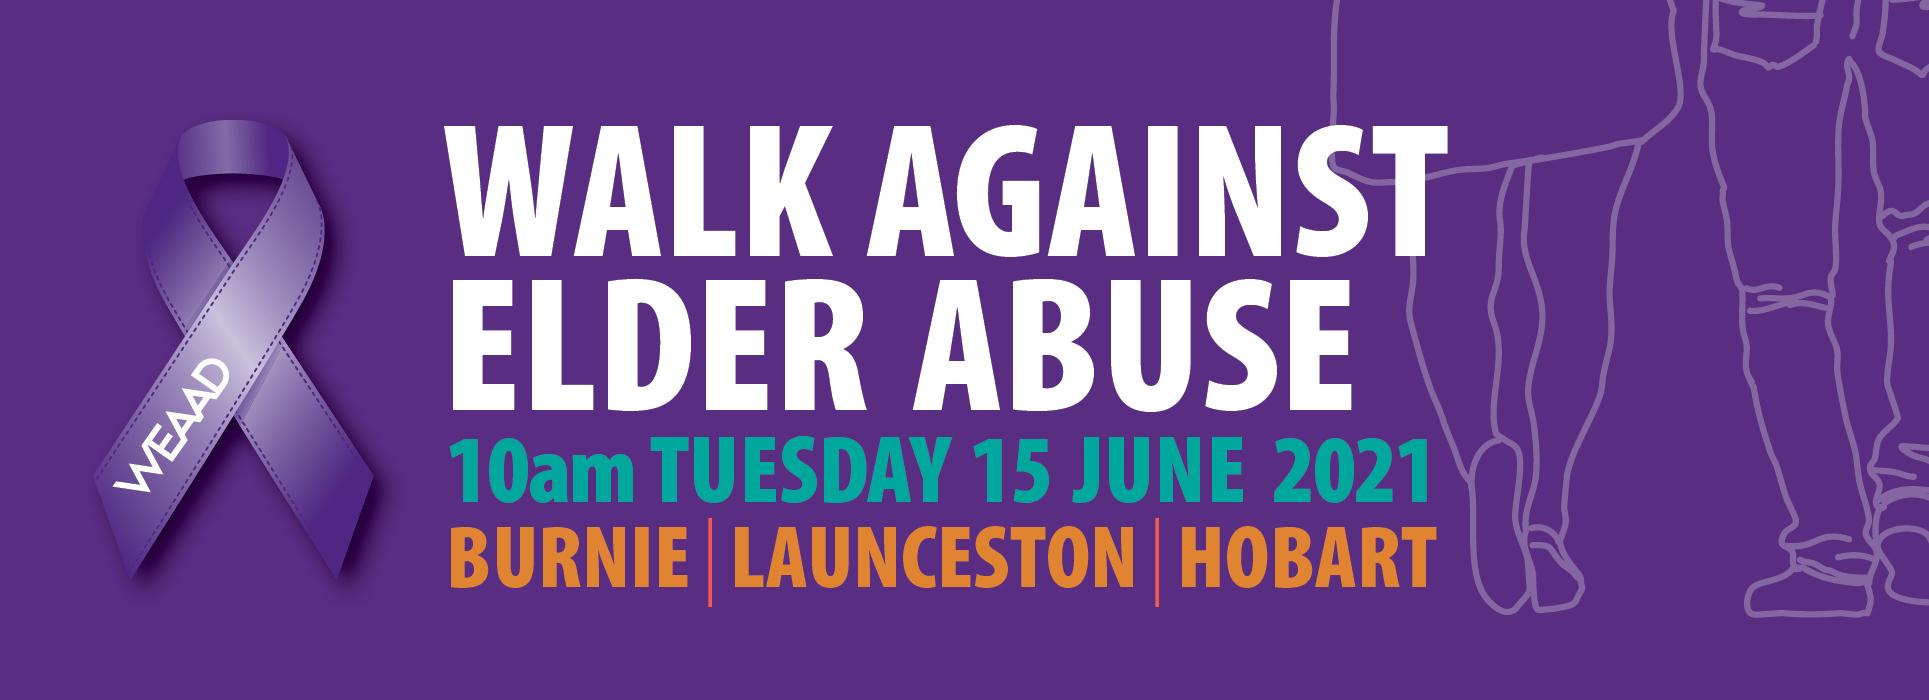 COTA Walk Against Elder Abuse